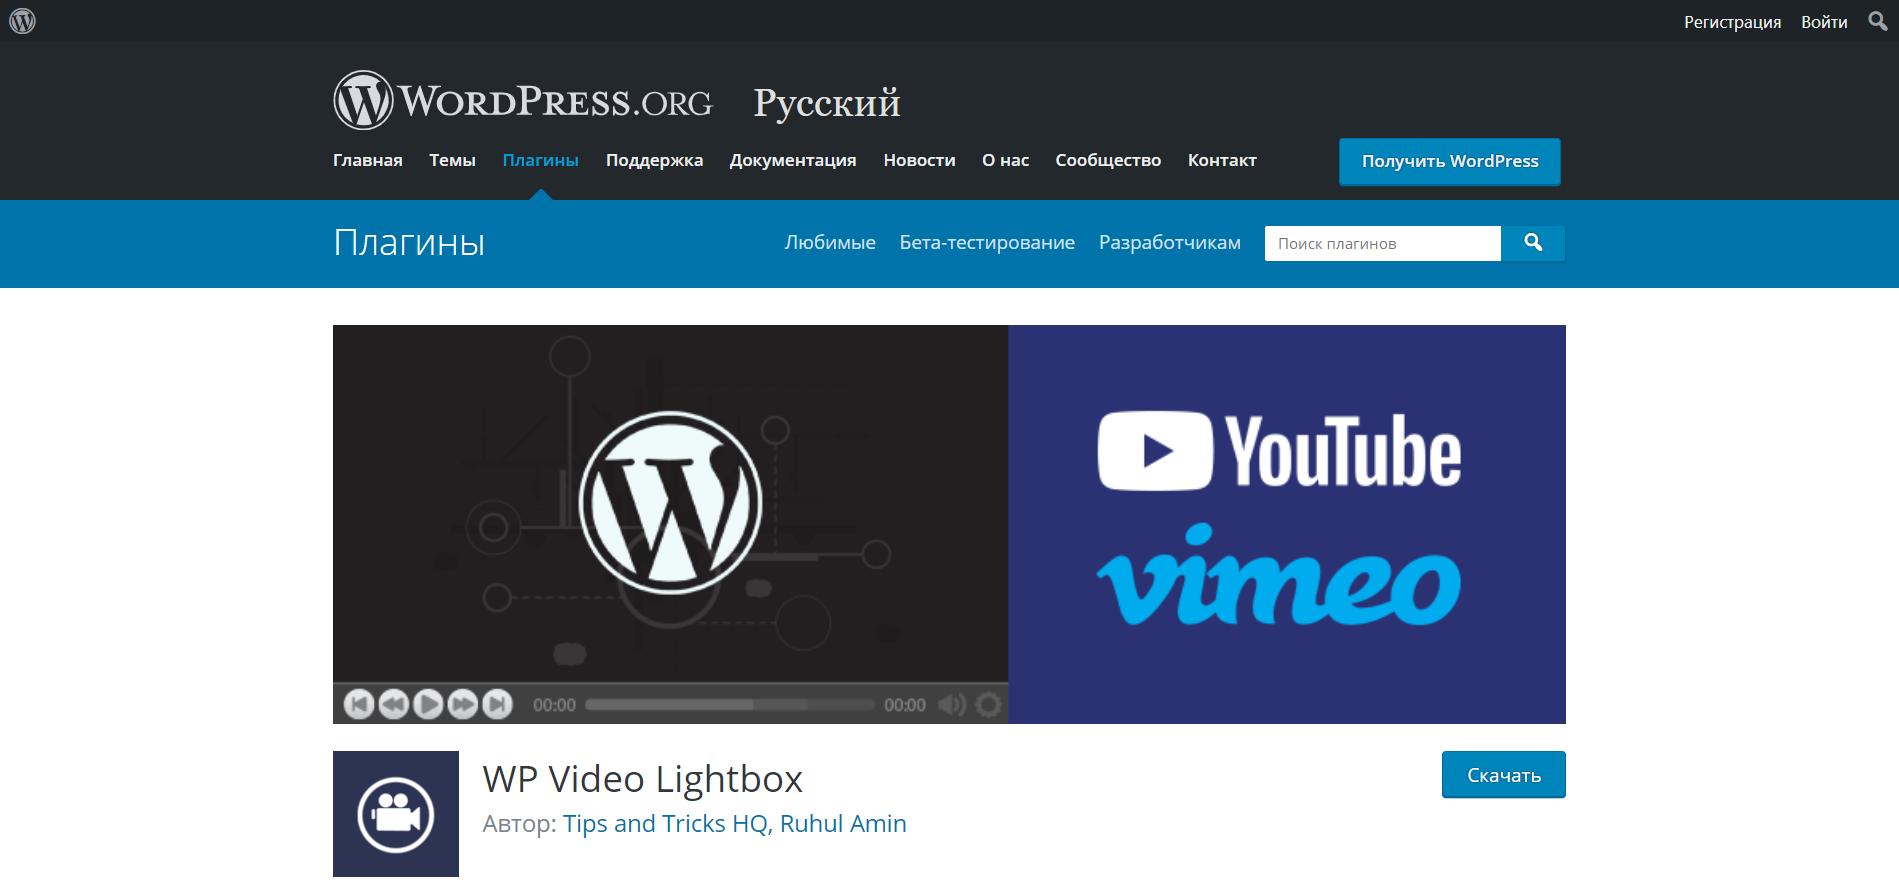 WordPress Video Lightbox видеоплагин для WordPress